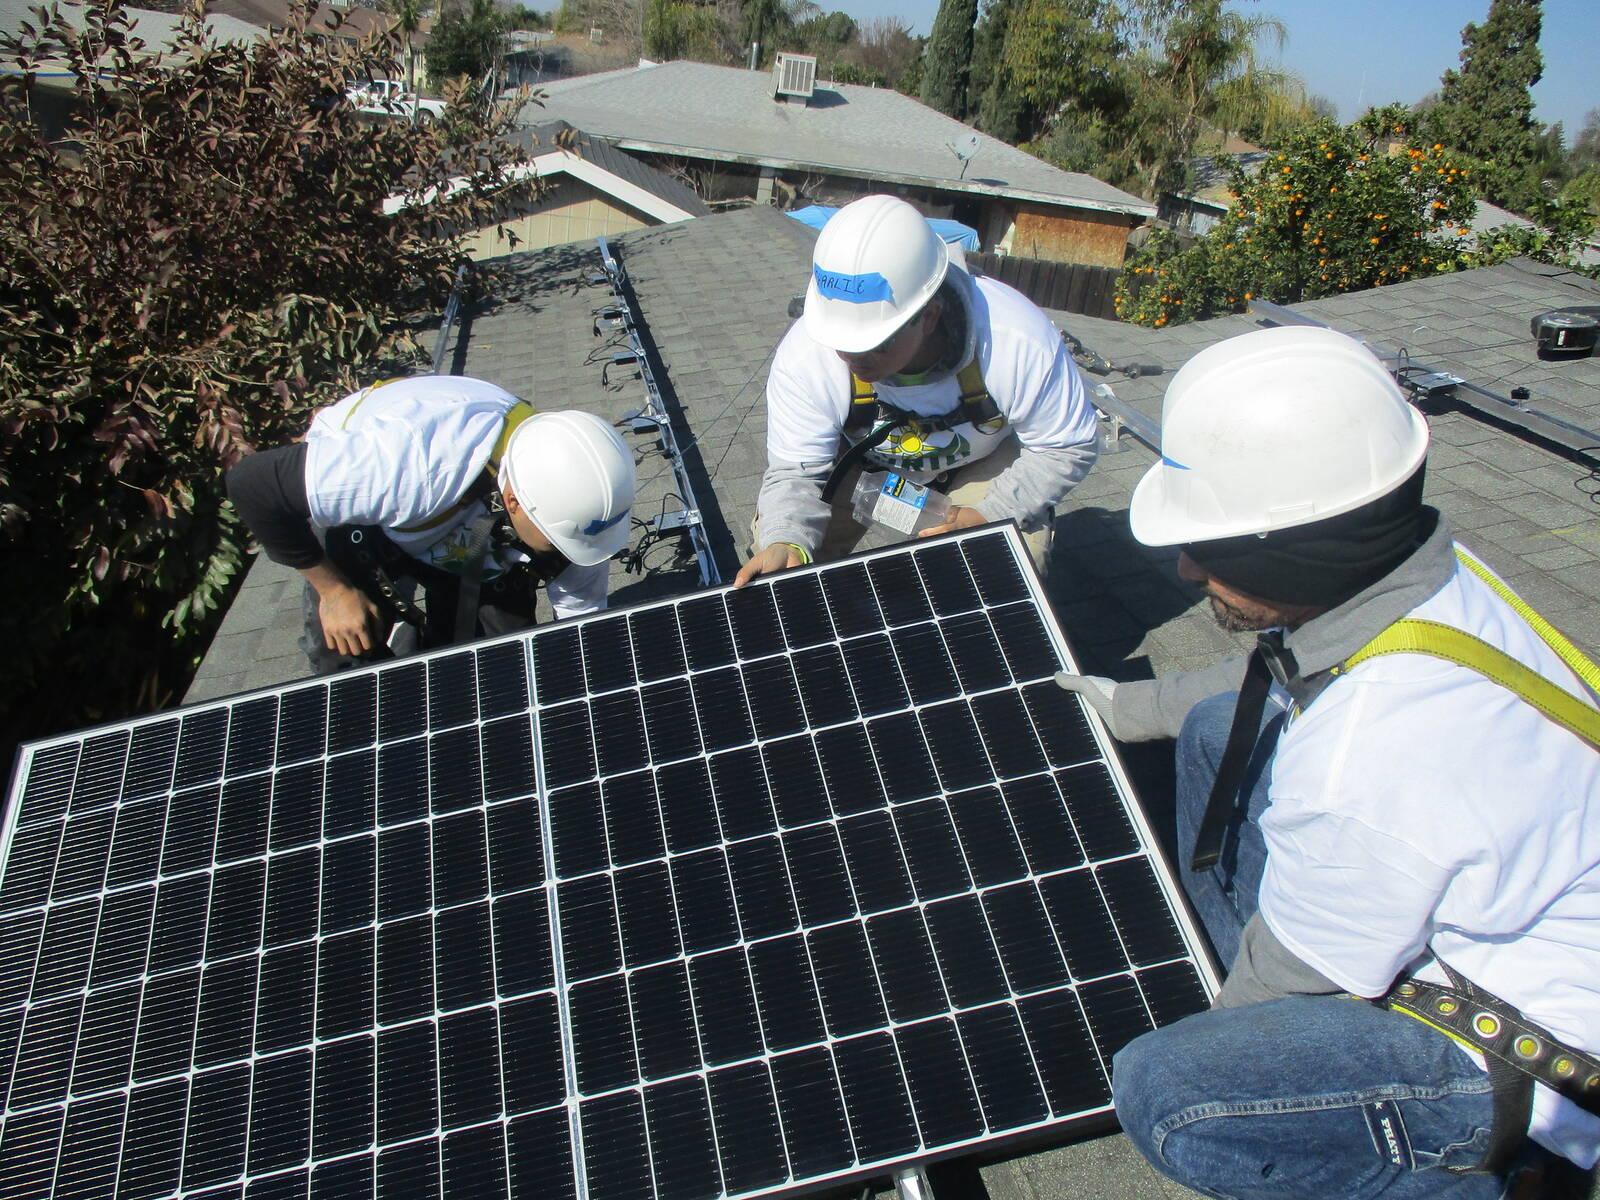 Volunteers for the nonprofit Grid Alternatives install solar panels on a house in Farmersville, California. Credit: Grid Alternatives